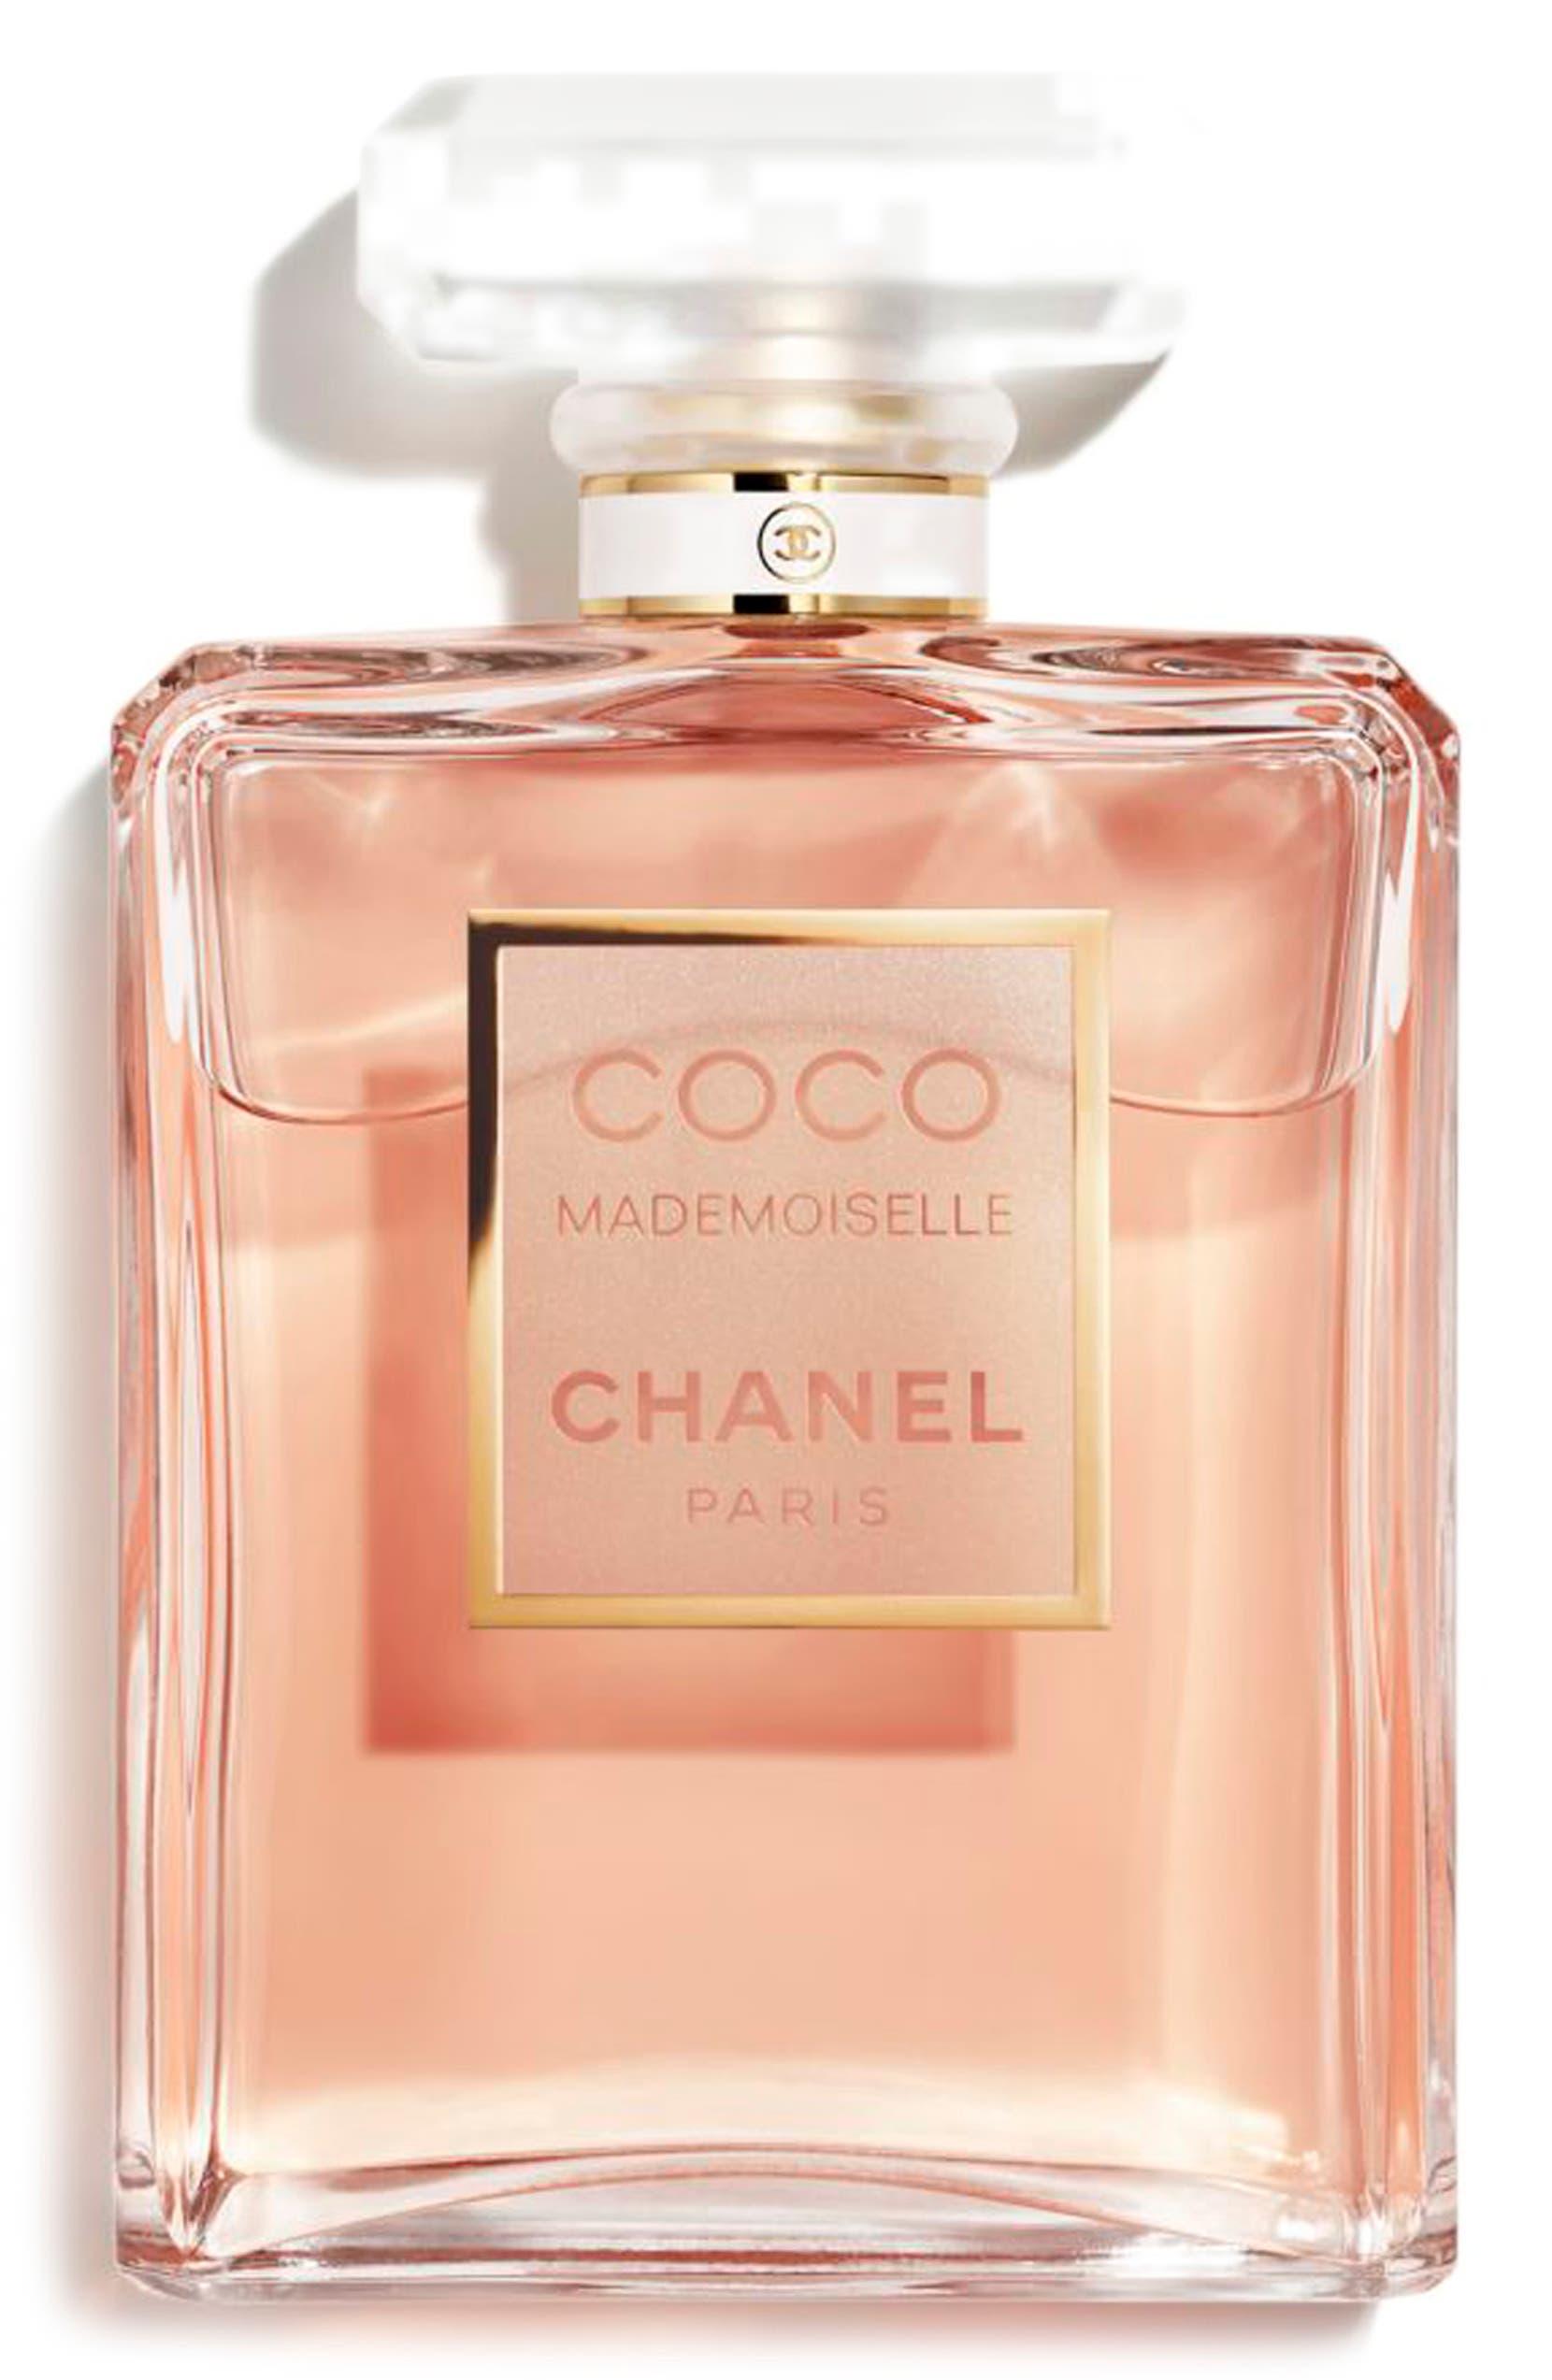 CHANEL COCO MADEMOISELLE Eau De Parfum Spray  2605383930